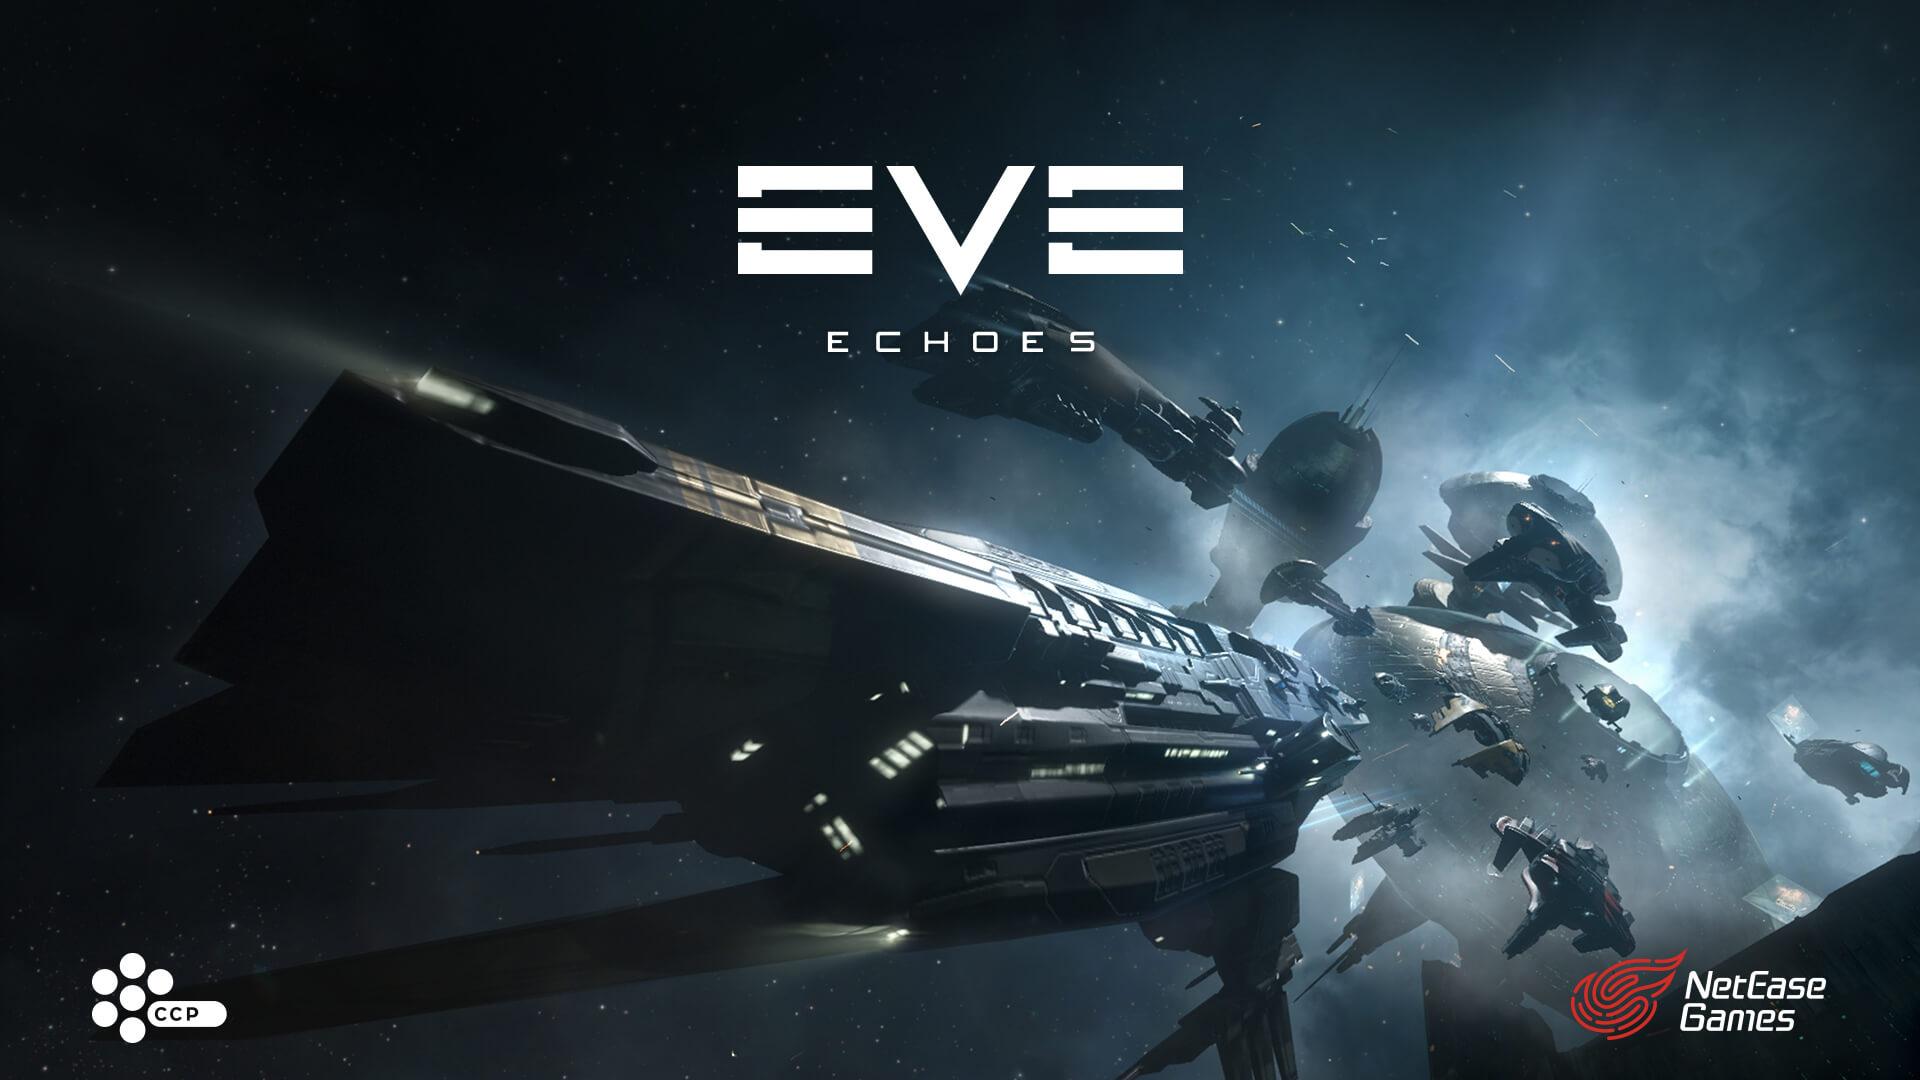 Photo of اللعبة المُنتظرة EVE Echoes متاحة الآن كإصدار تجريبي ومحدود على أندرويد